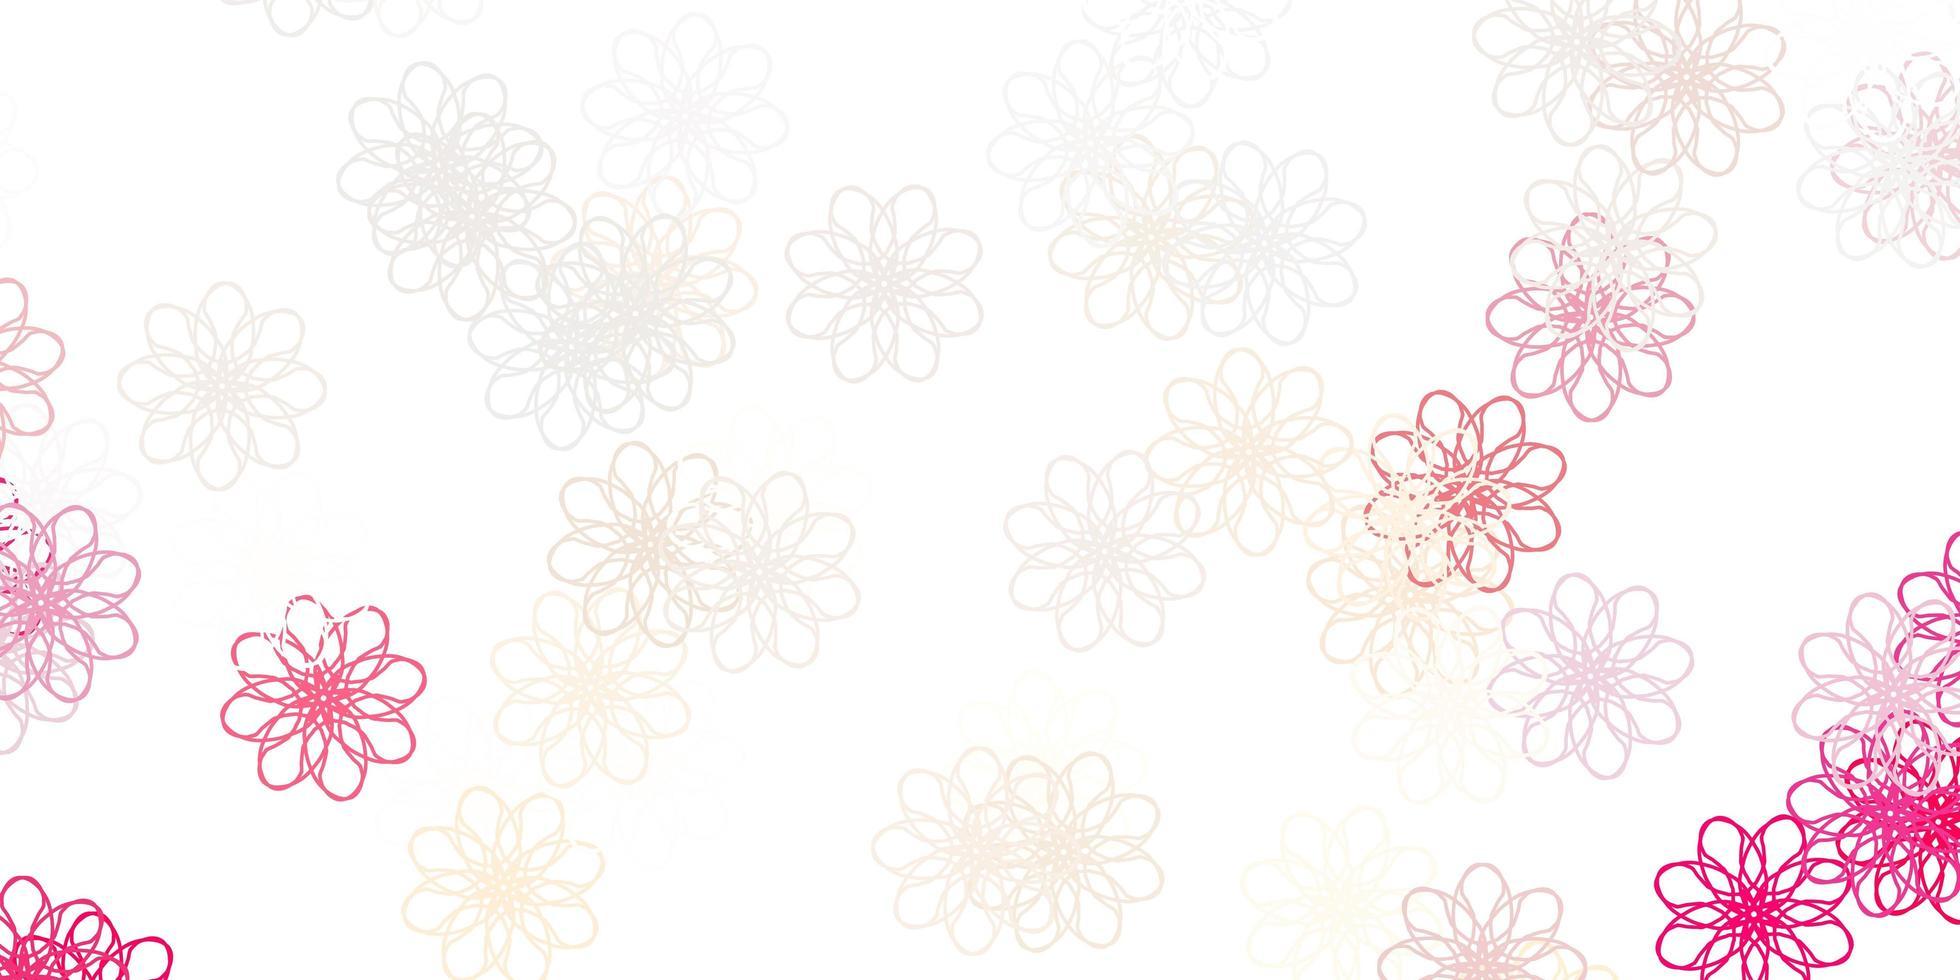 diseño natural rojo con flores. vector